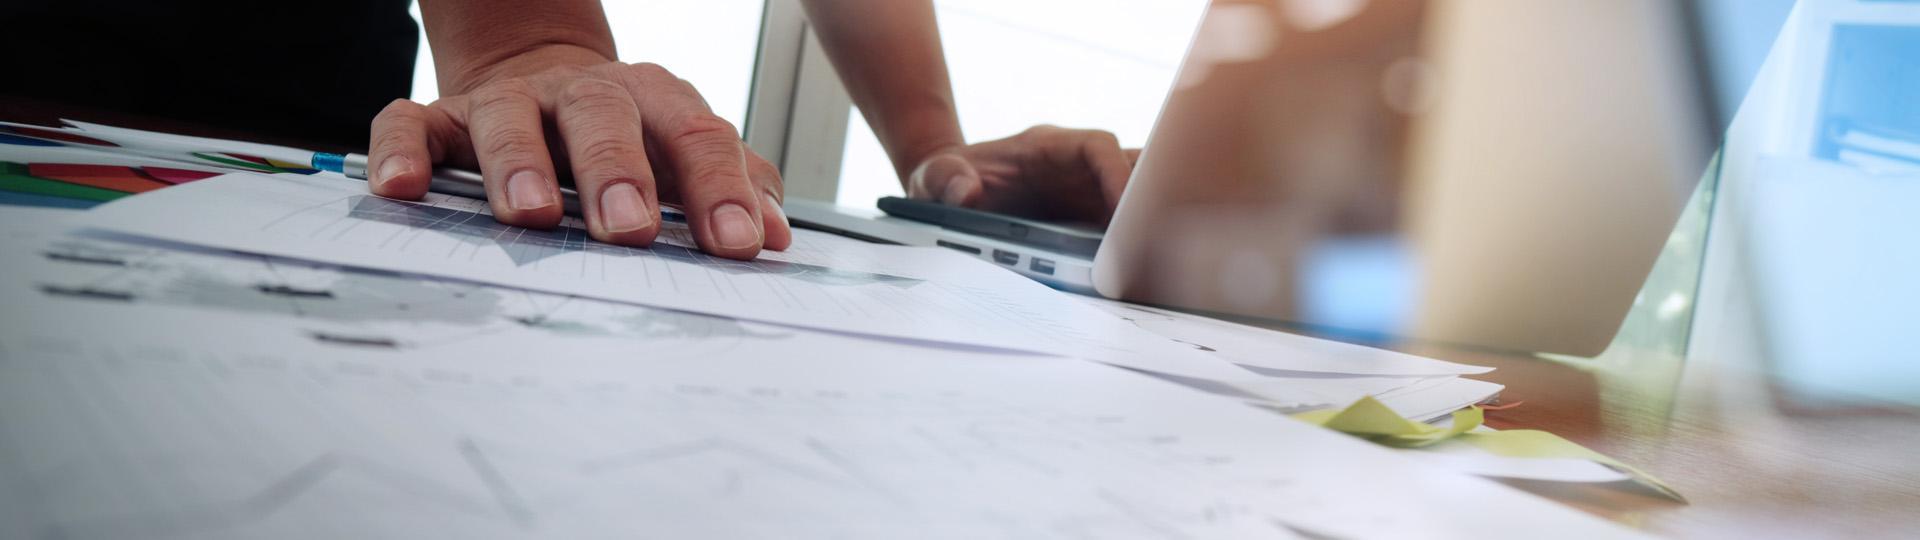 Relentless client focus and constant communication, it's the Alpha Advantage